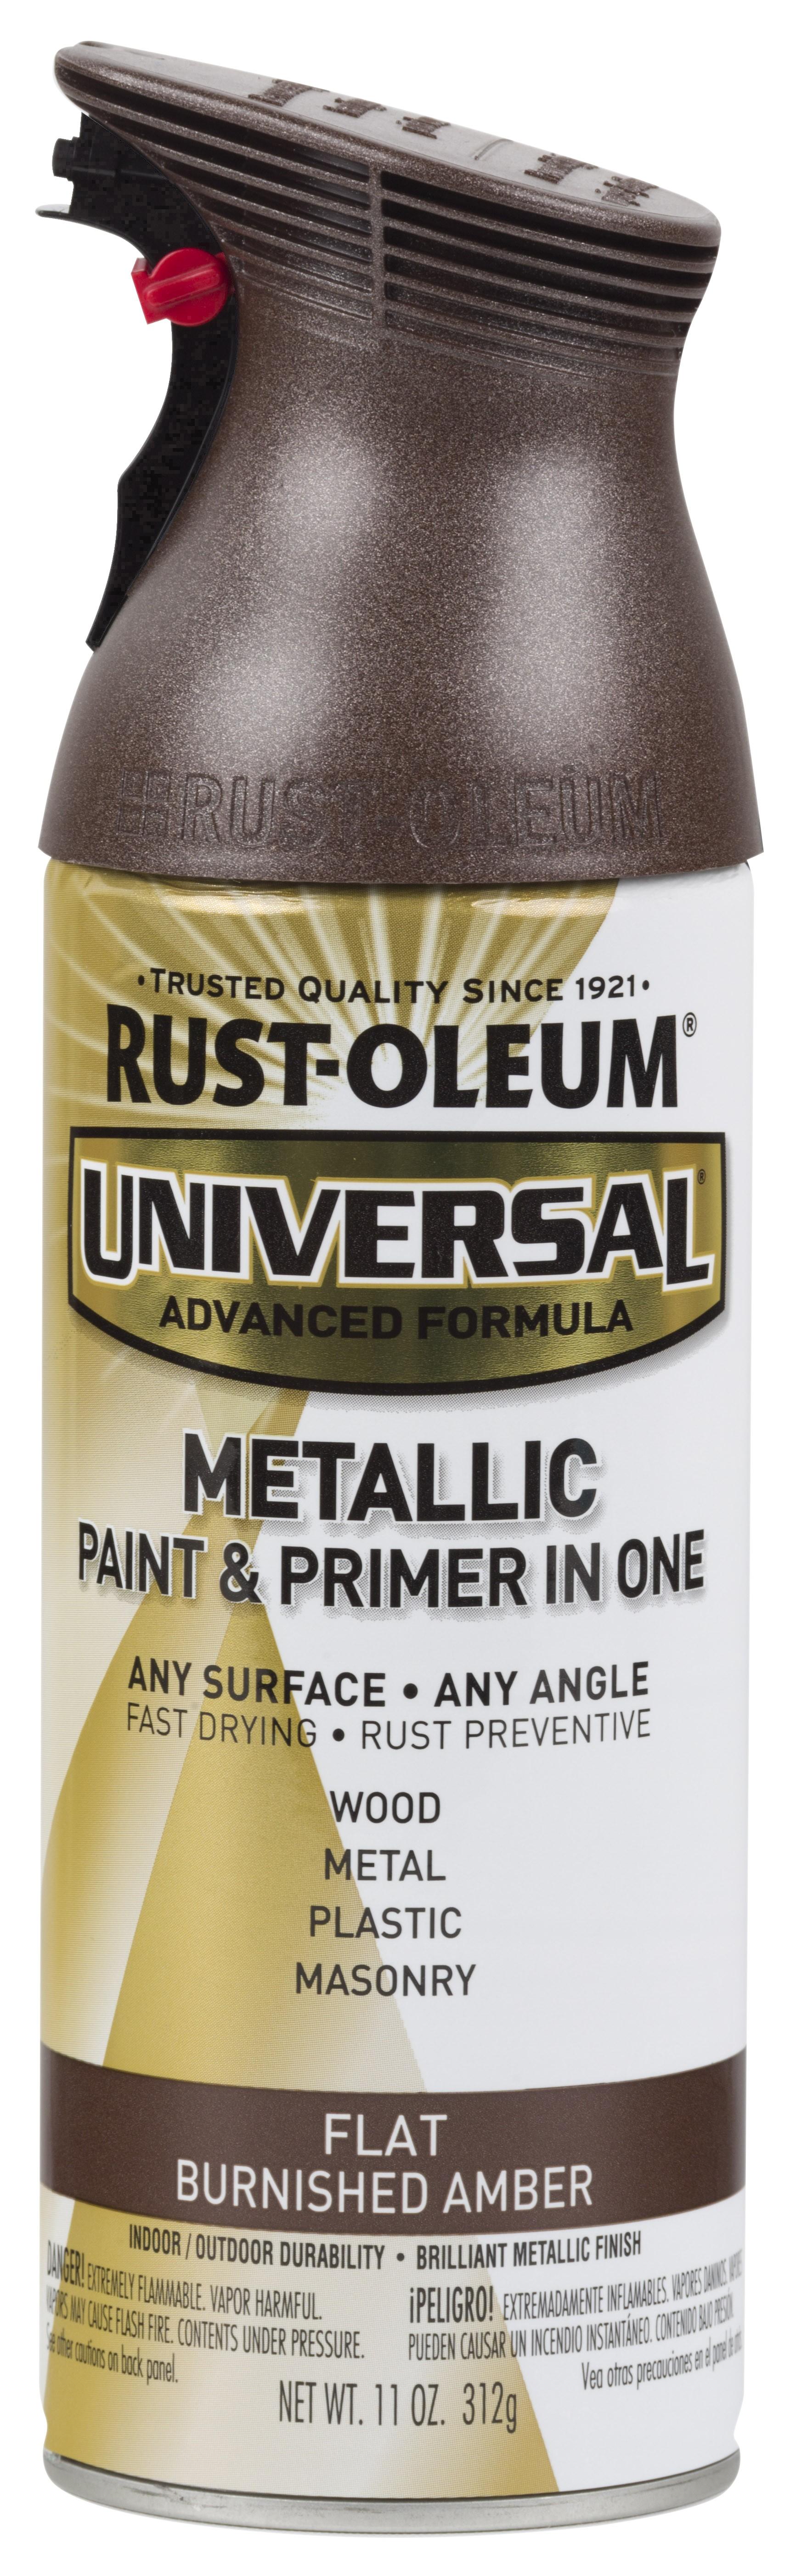 CGSignLab Ghost Aged Rust Premium Brushed Aluminum Sign Under New Management 36x24